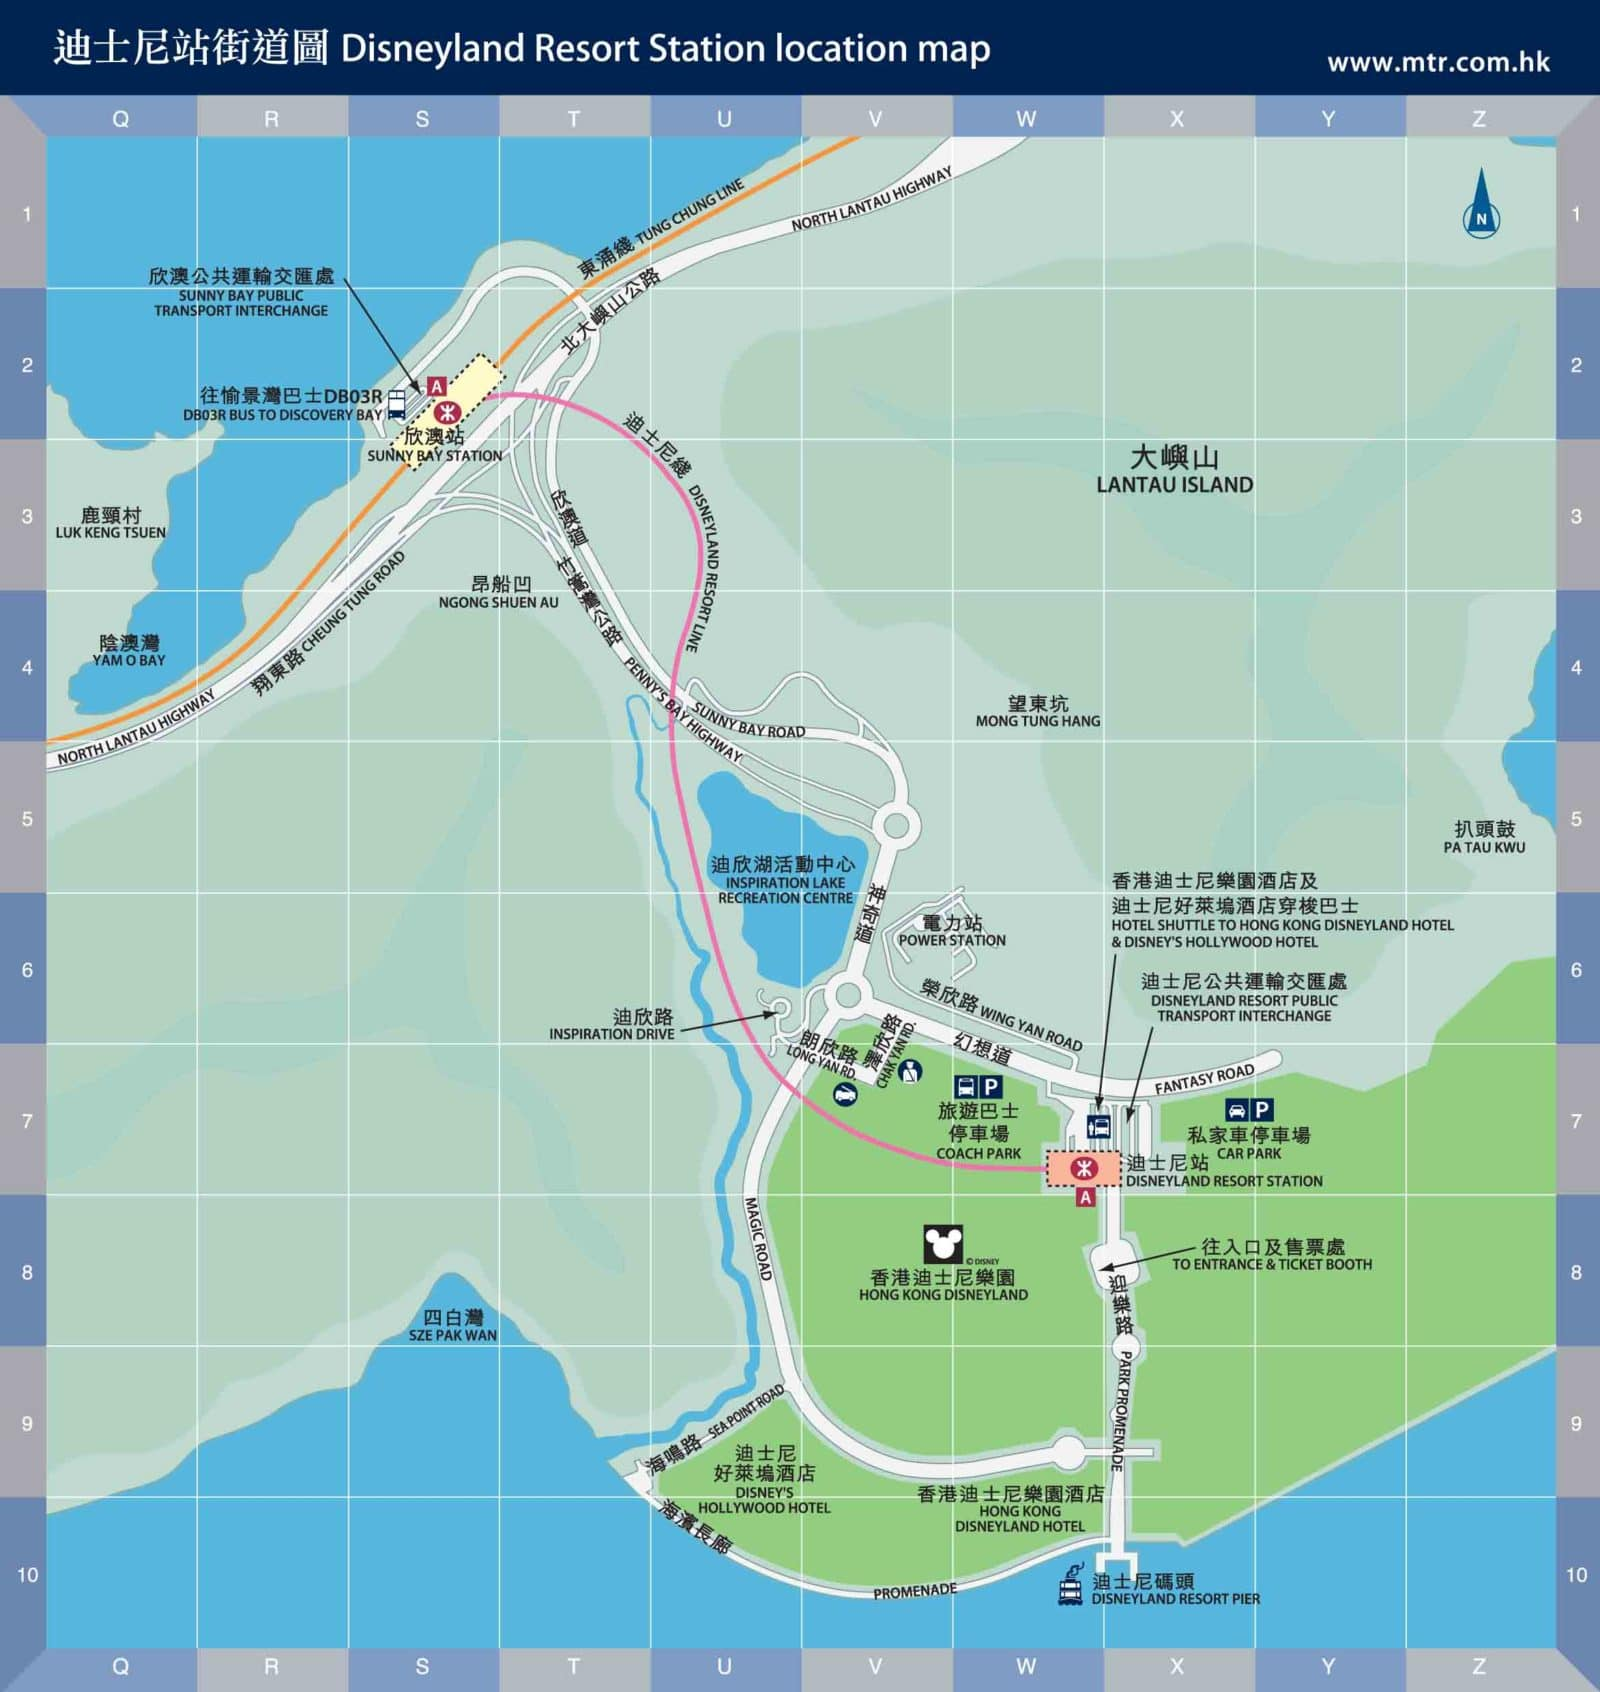 Lantau Island: Disneyland MTR station area map 2012-2013